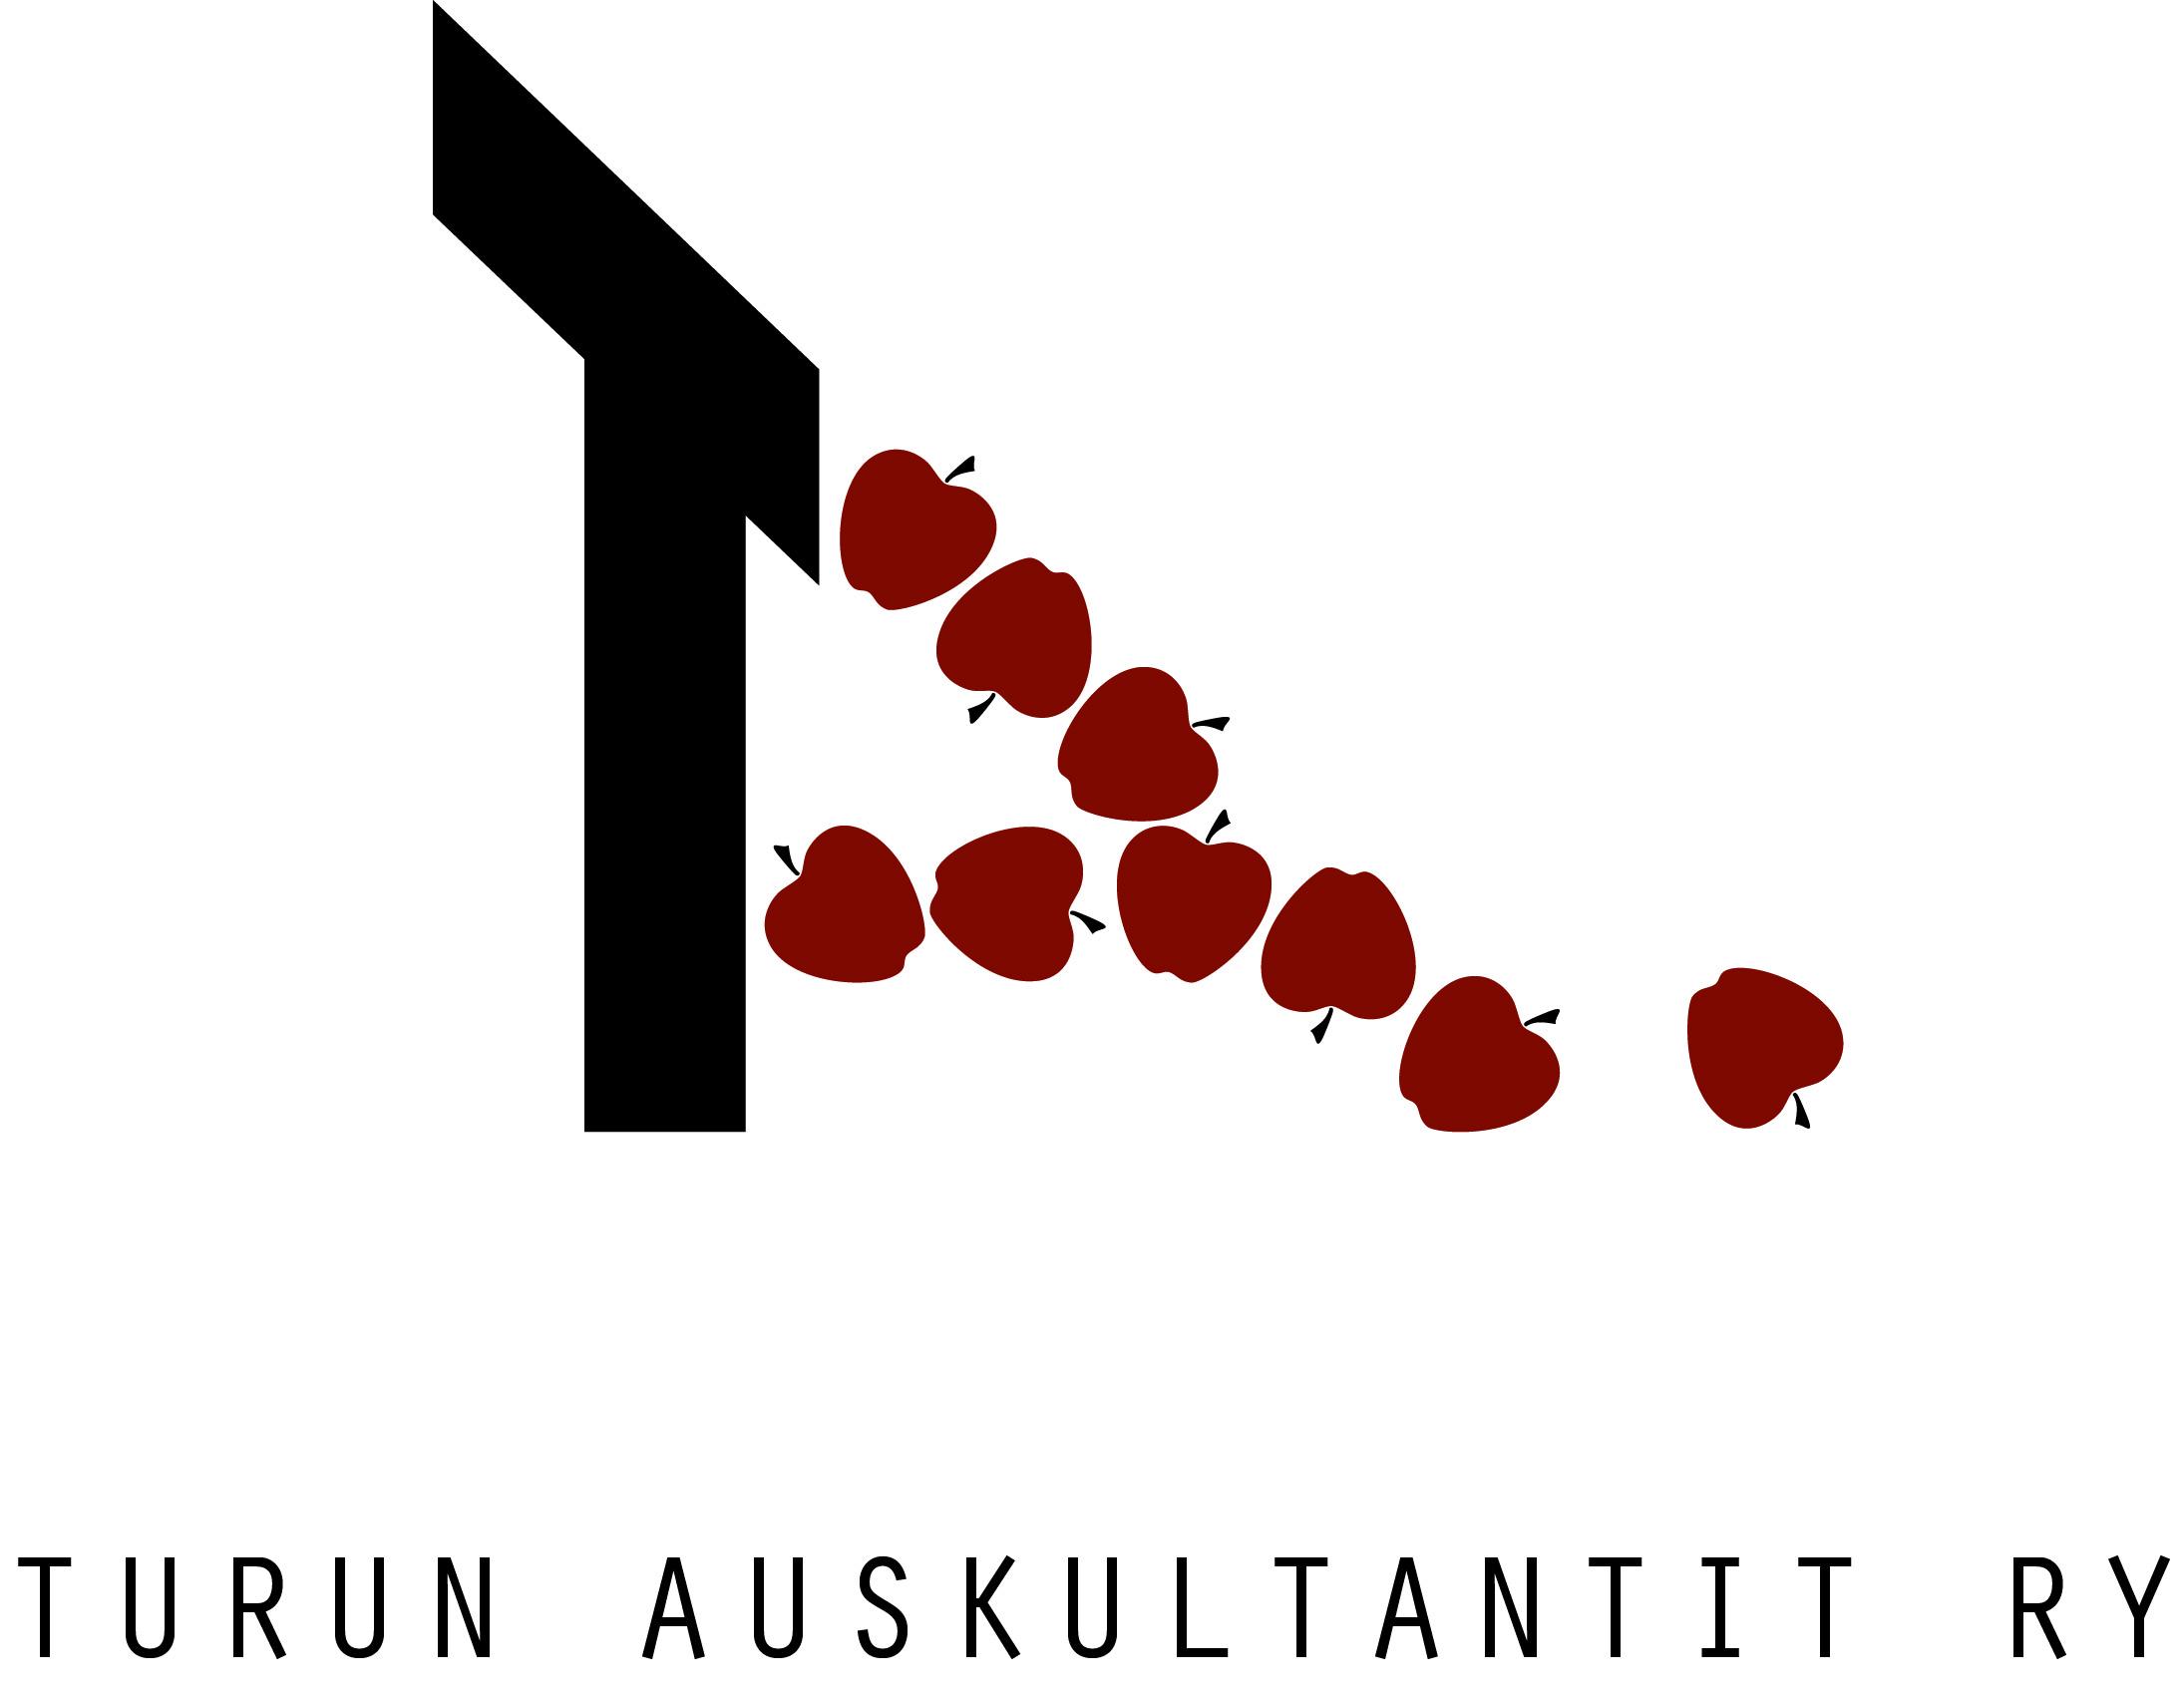 Turun Auskultantit ry | Turun Auskultantit ry